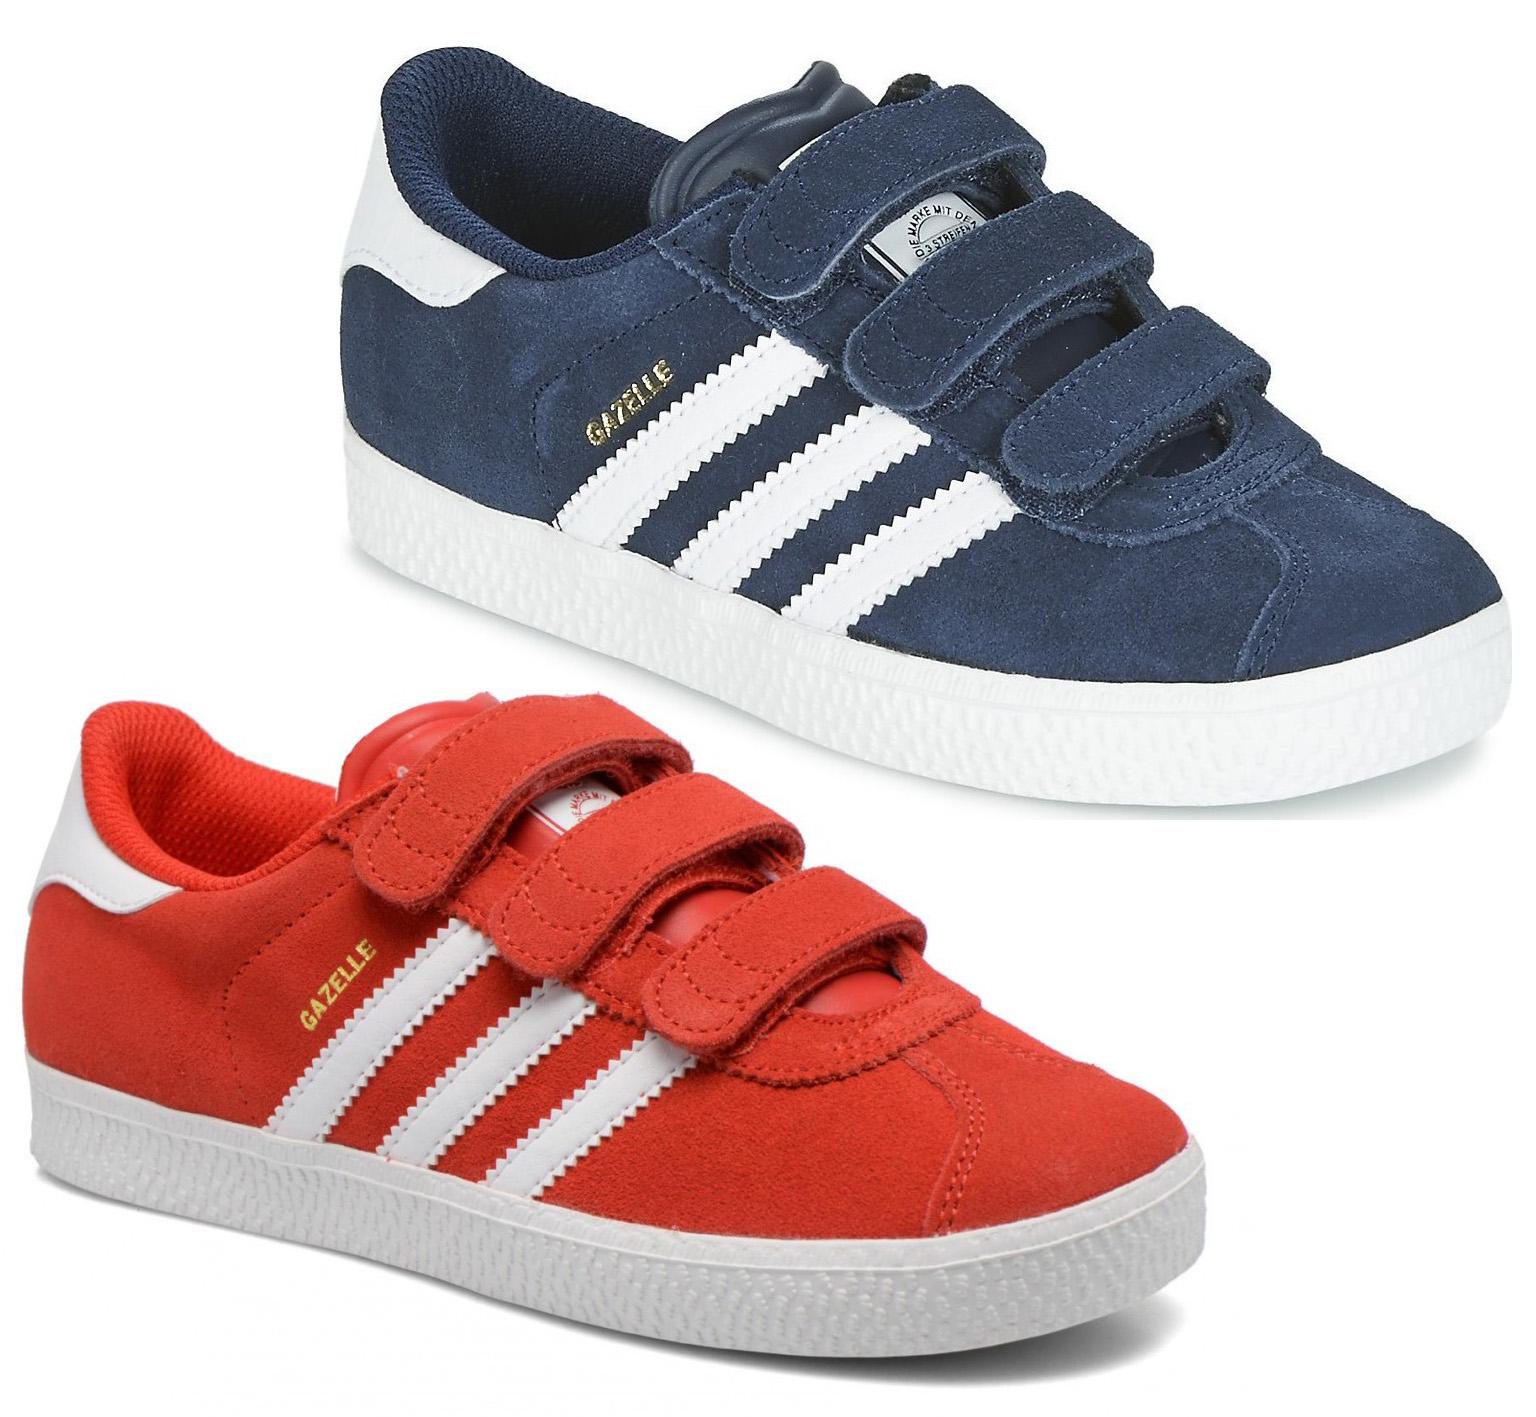 adidas gazelle youth